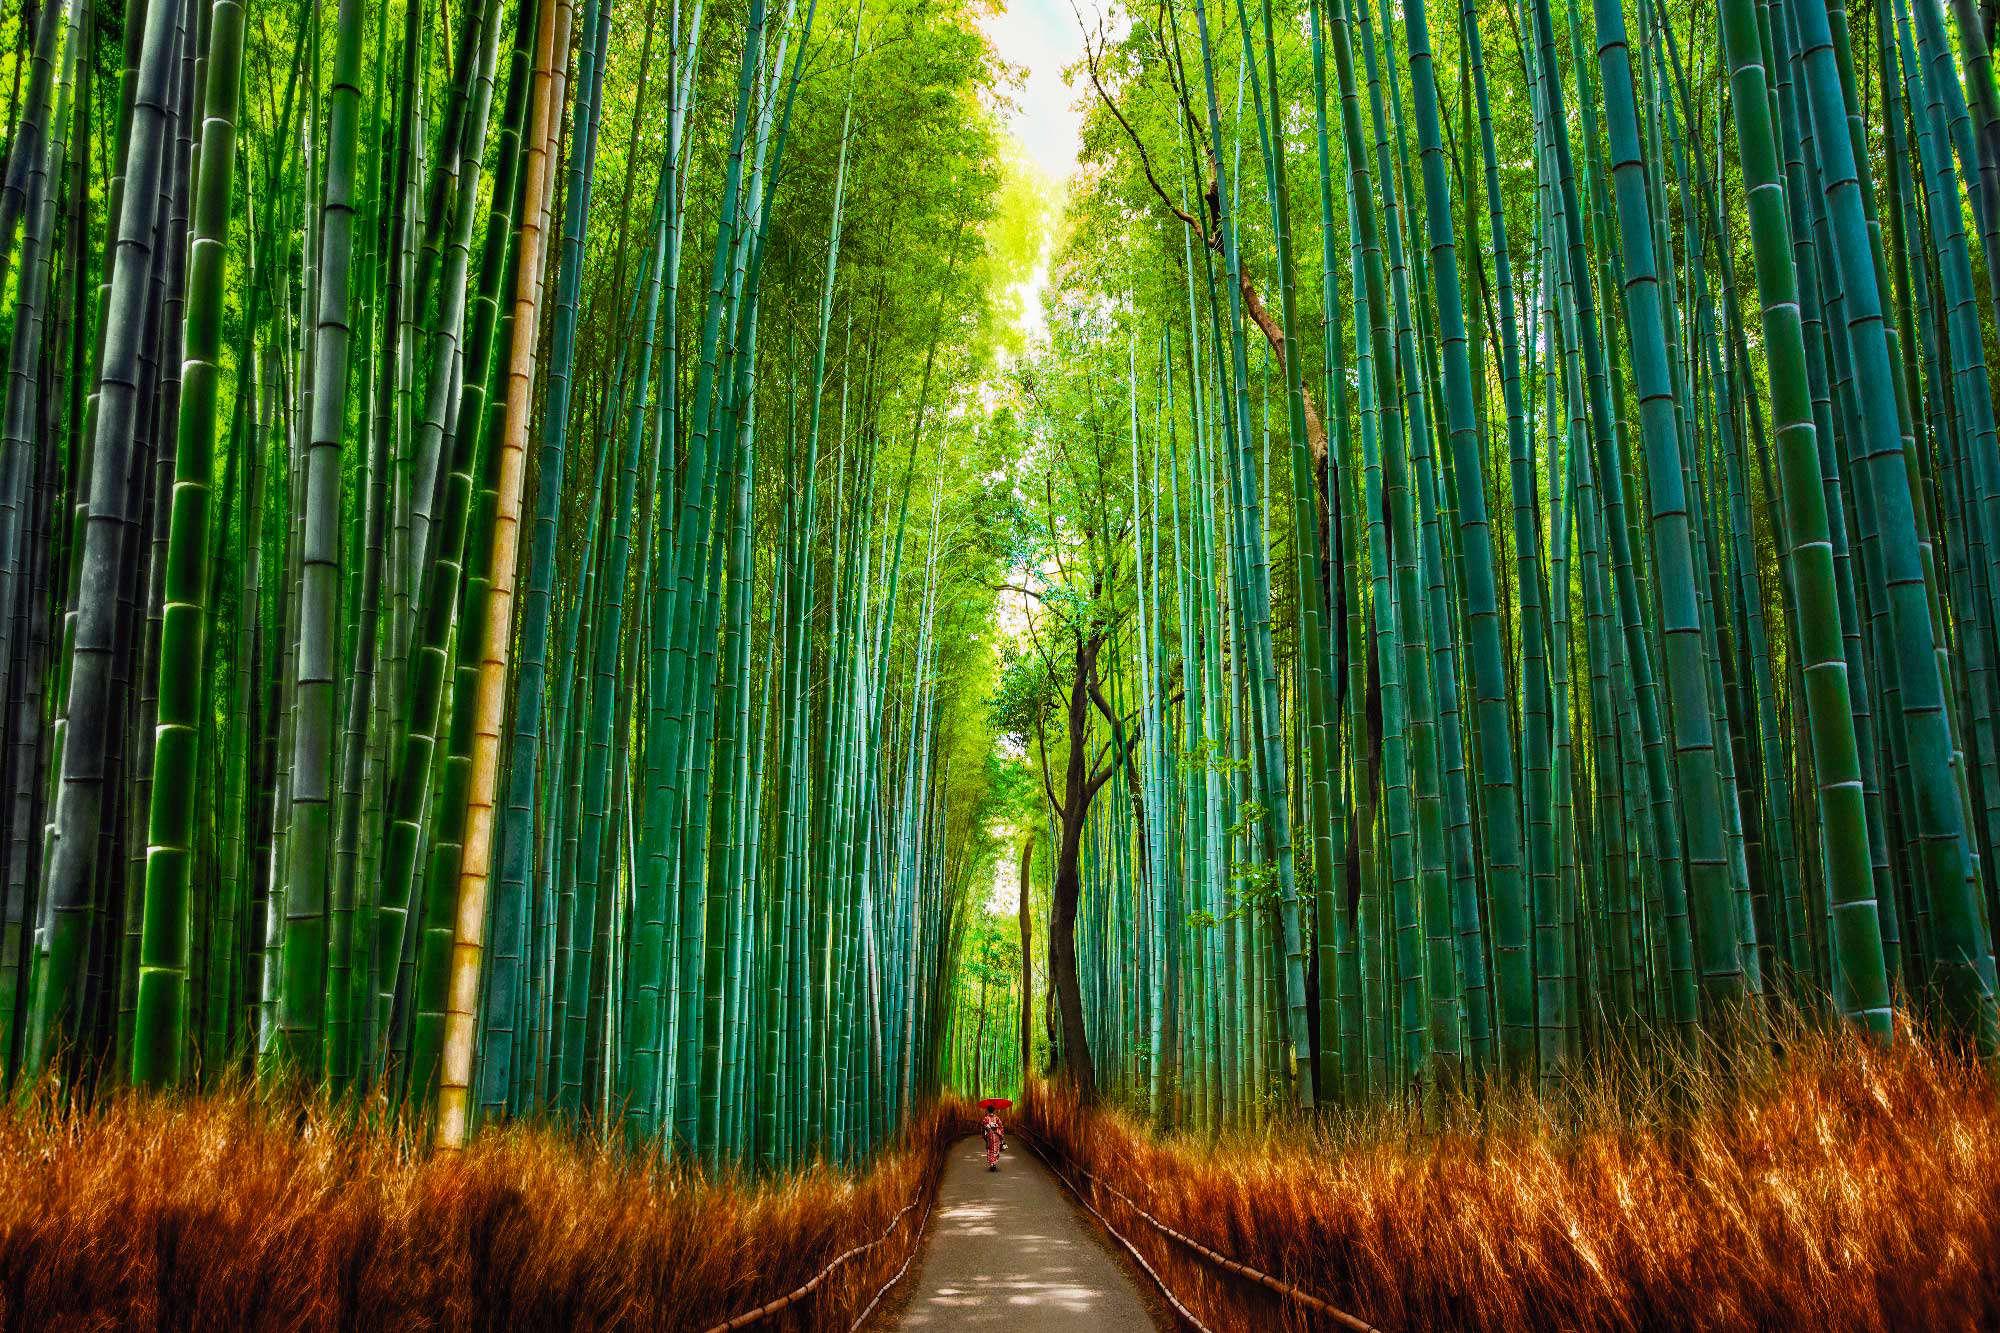 Allan Chan - Bamboo Forest